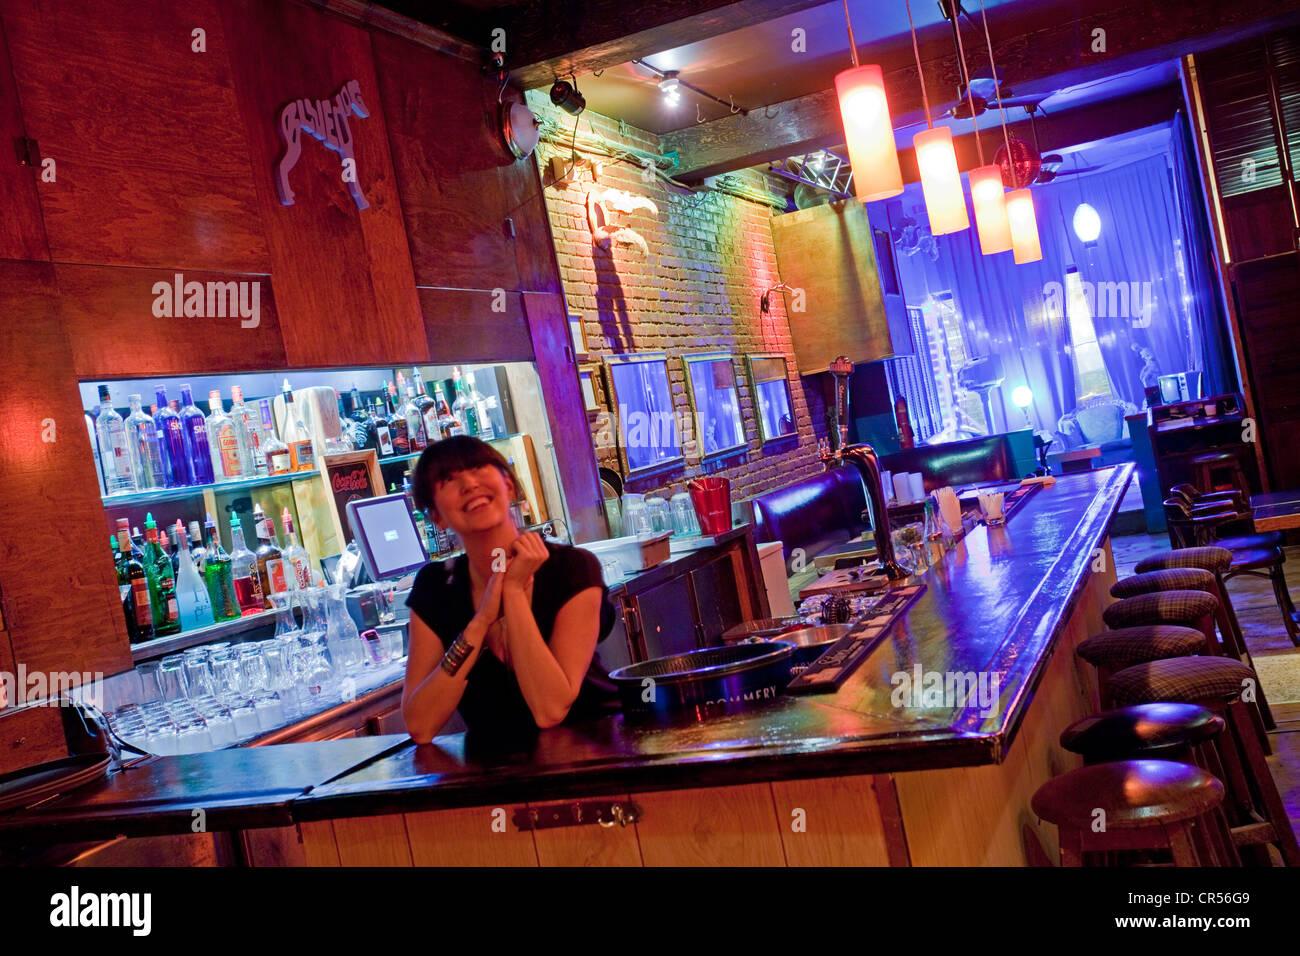 Canada, Quebec Province, Montreal, Boulevard Saint Laurent, Blue Dog Lounge bar and nightclub - Stock Image